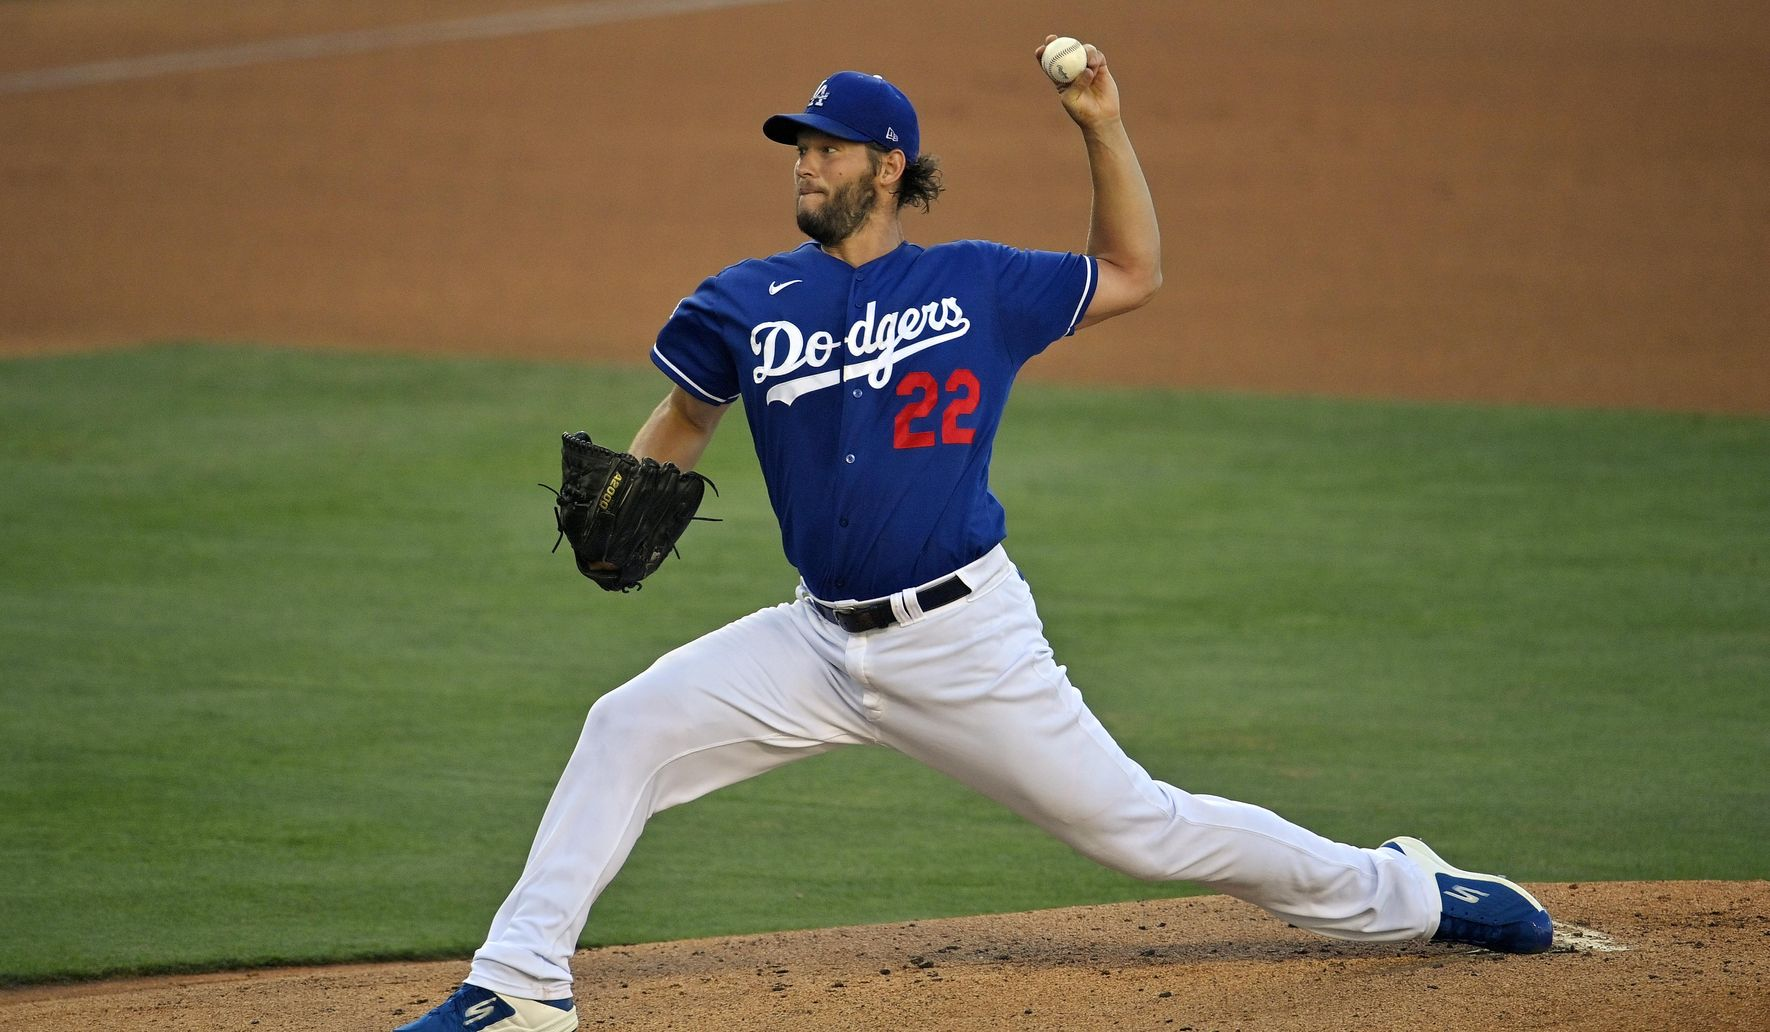 Dodgers_baseball_00686_c0-183-4385-2739_s1770x1032